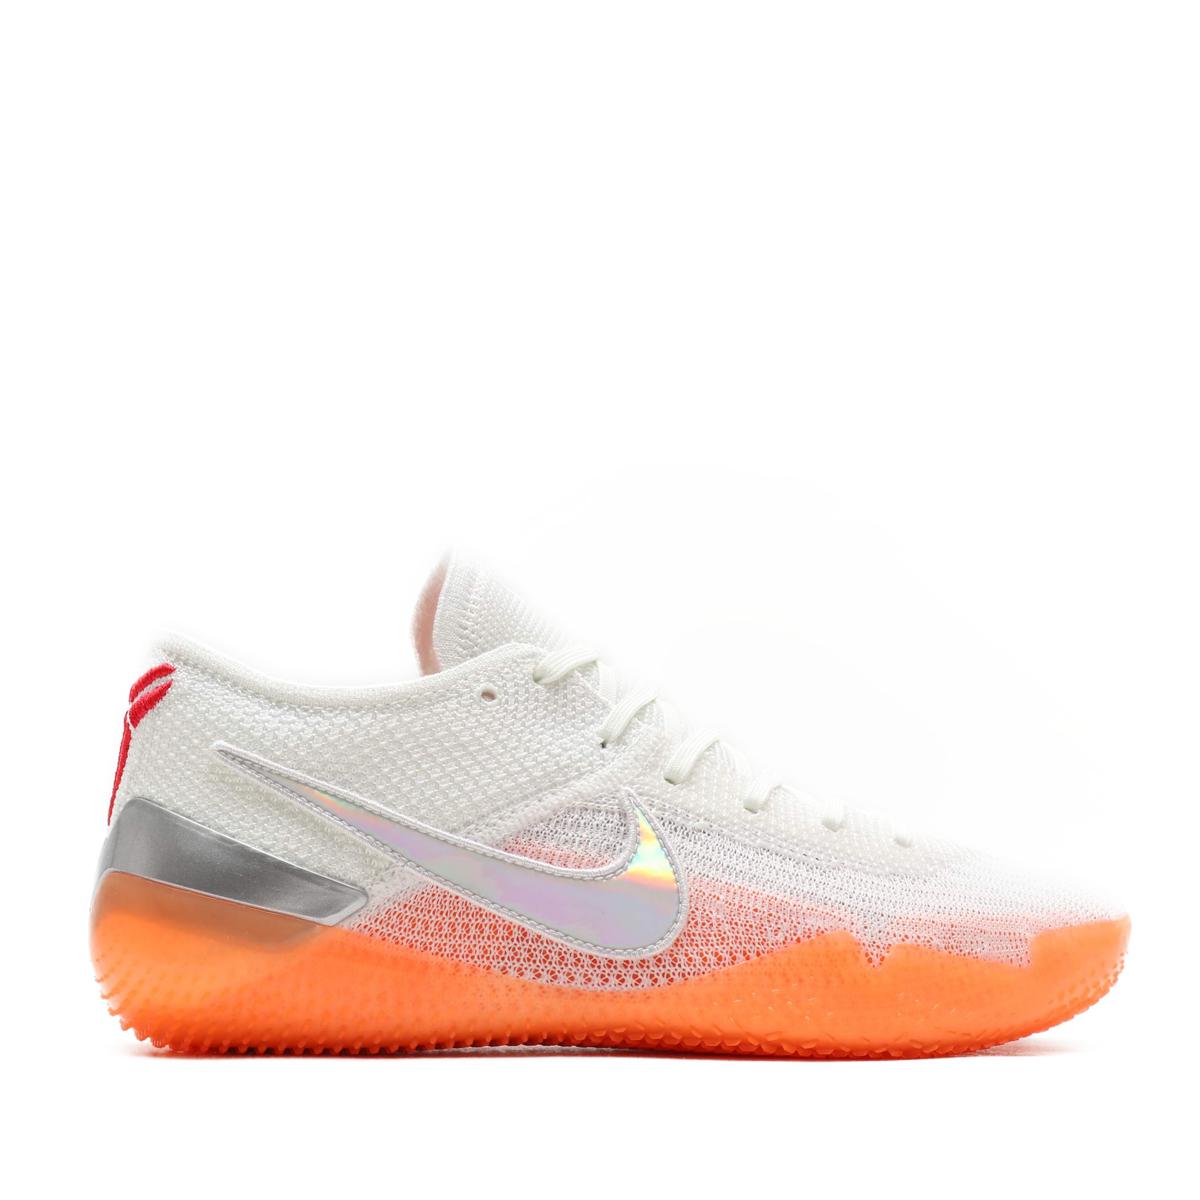 e348bcea26 atmos pink: NIKE KOBE AD NXT 360 (Nike Corby AD NXT 360) (WHITE ...